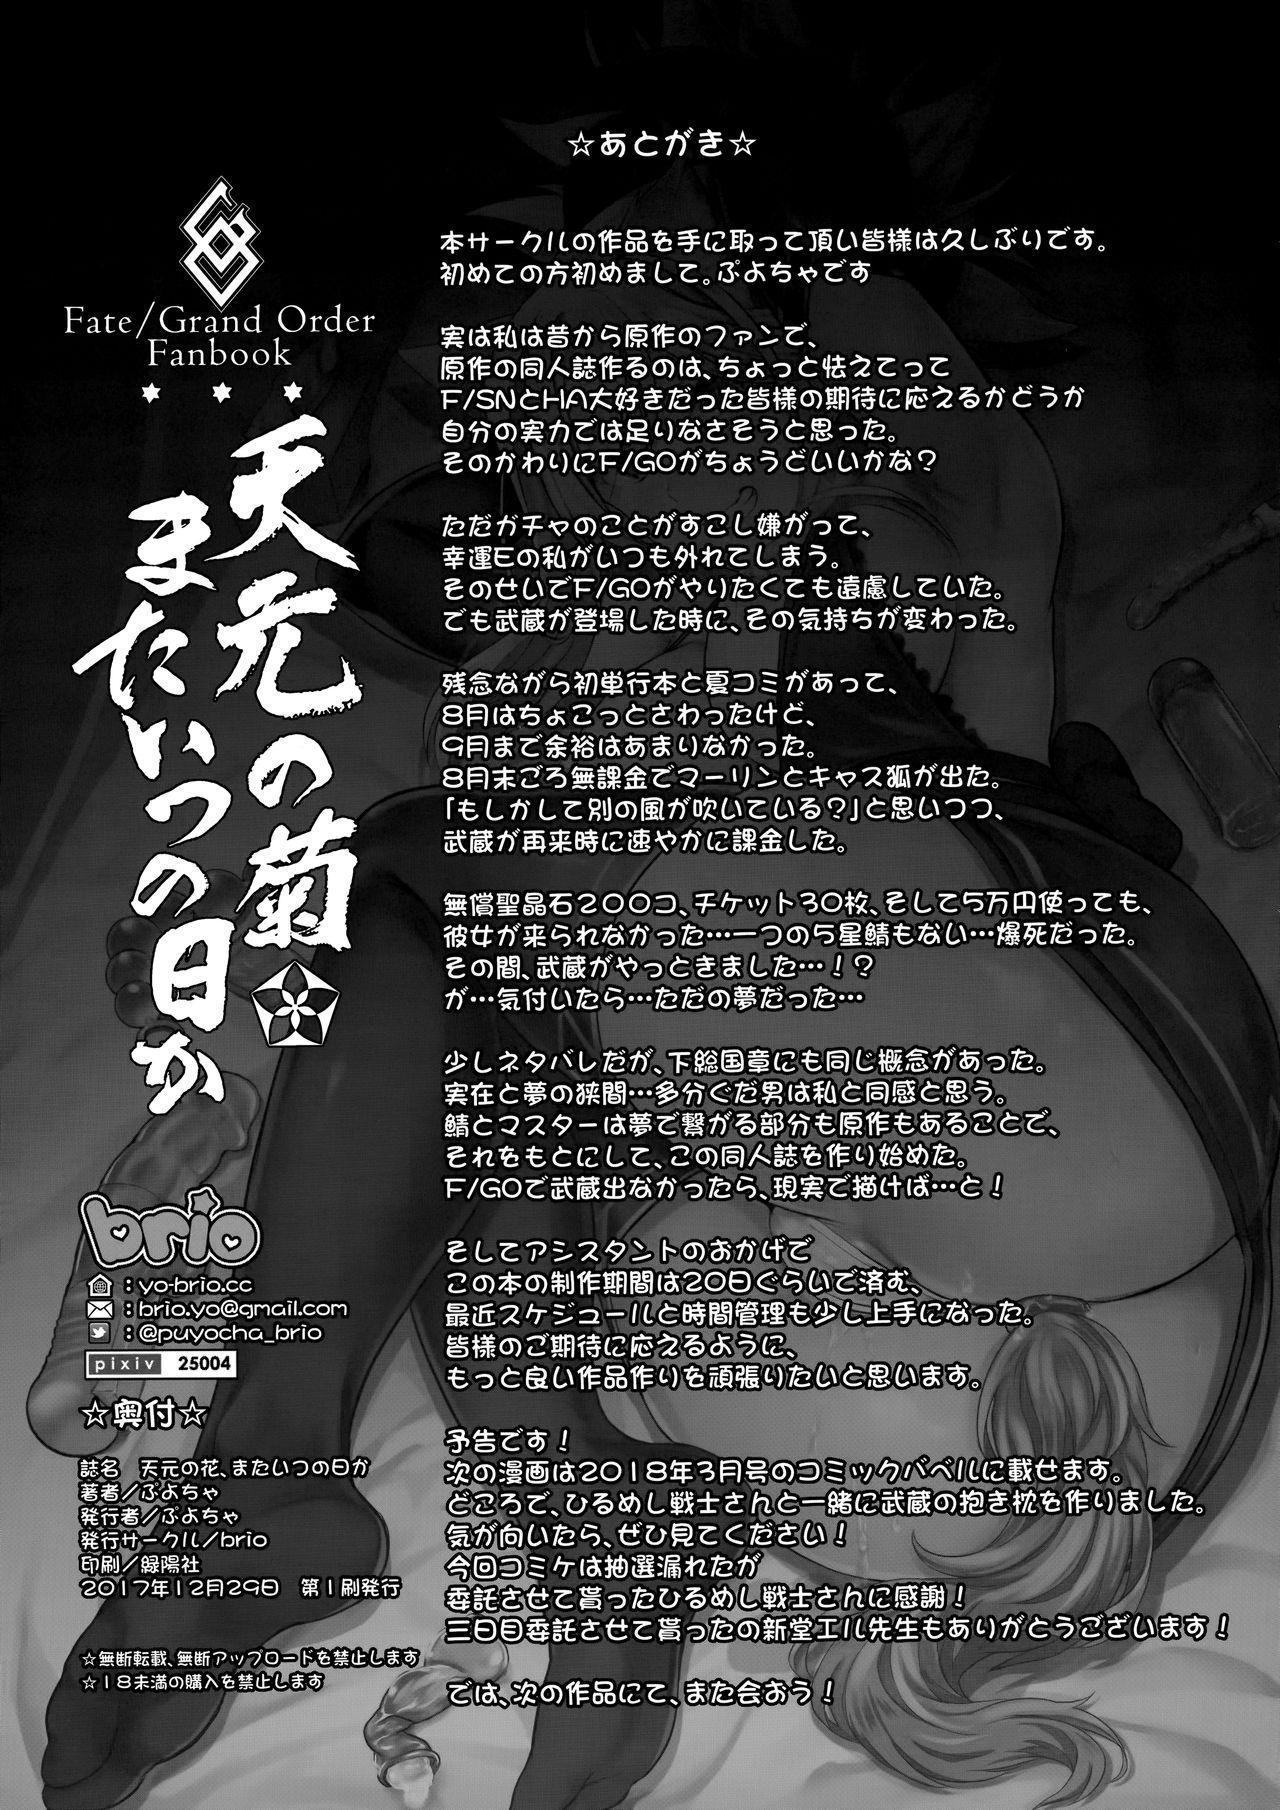 Tengen no Kiku, Mata Itsu no Hi ka   Tengen's chrysanthemum, let's see each other someday again 23